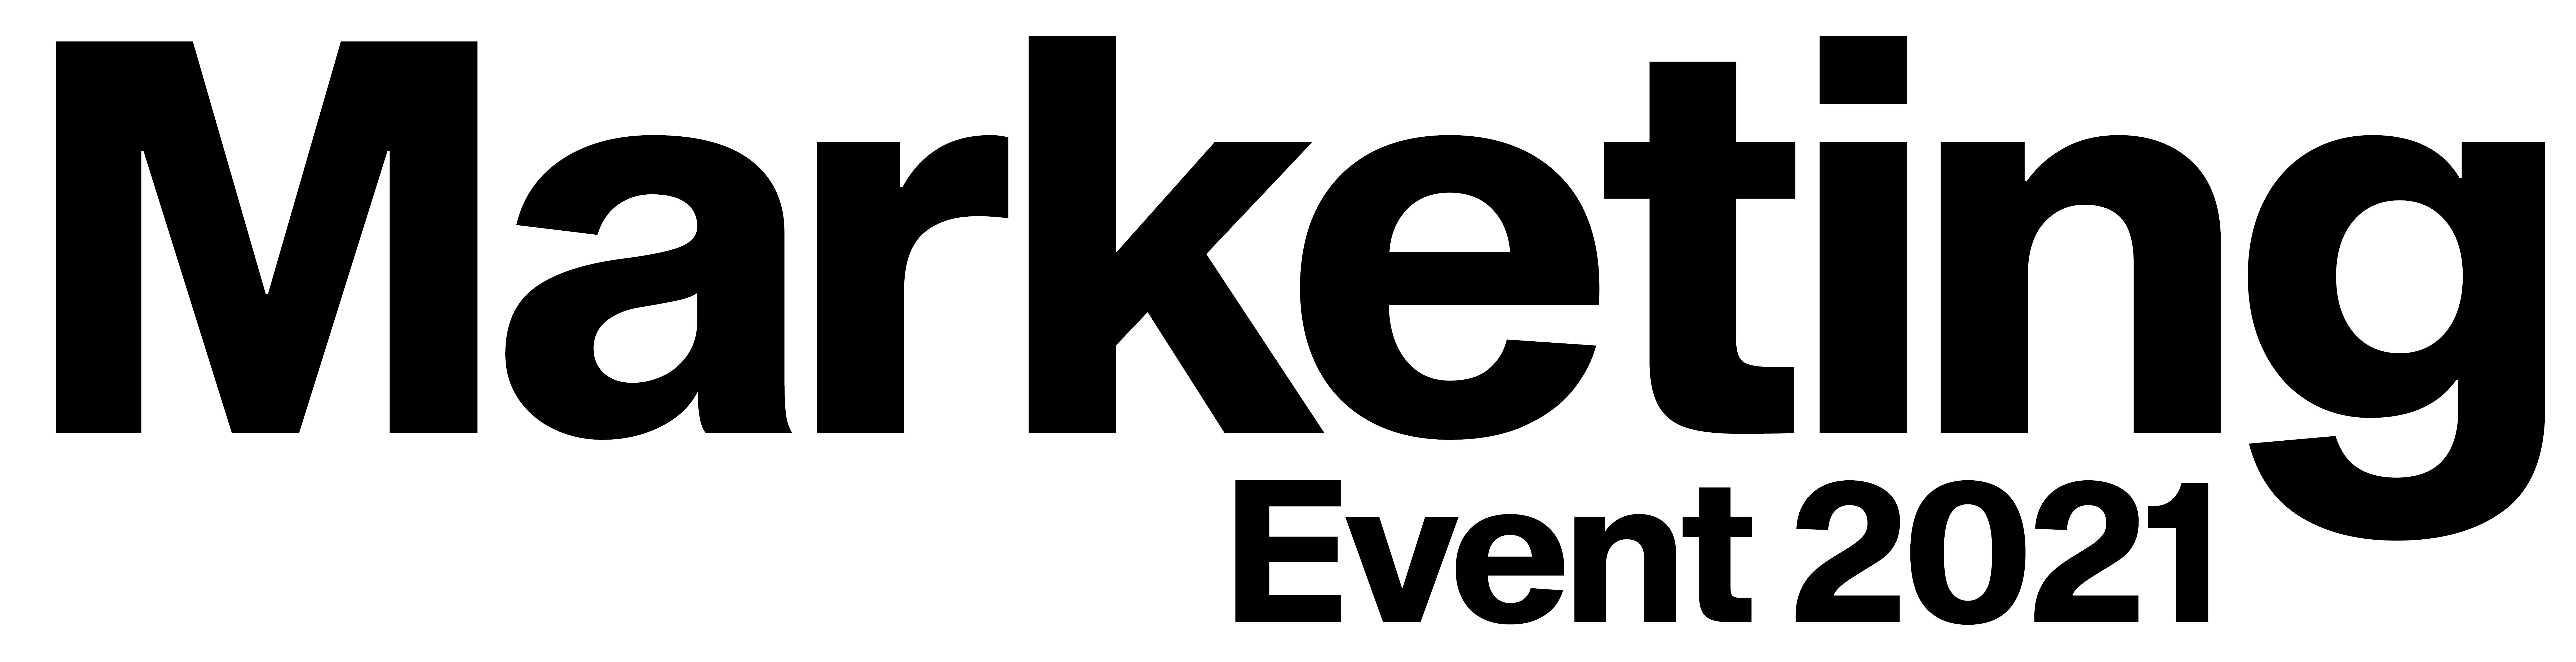 Marketing Event 2022